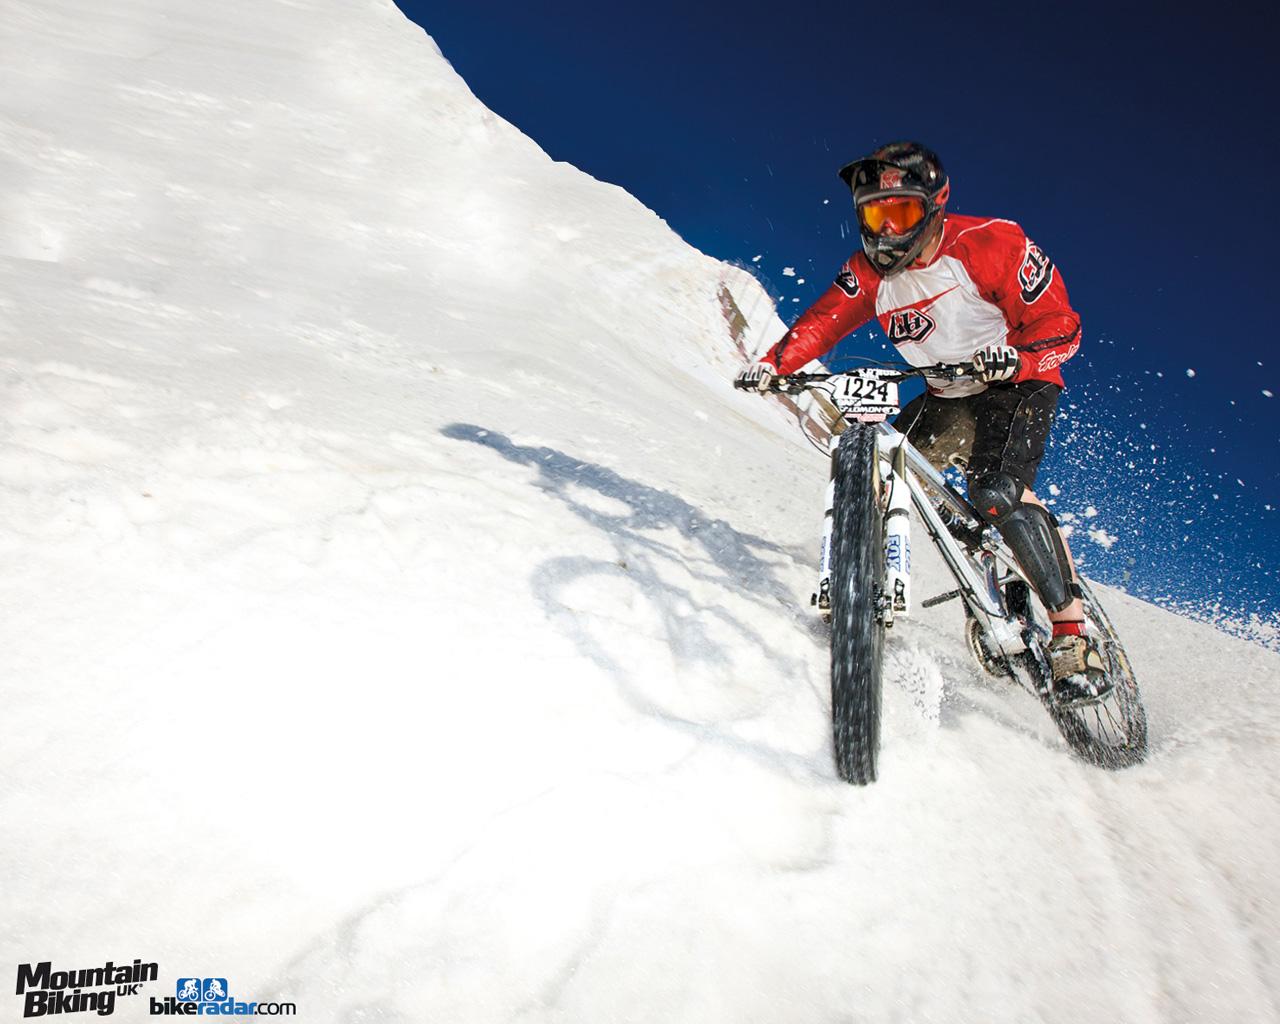 Обои вело, байк, снег, велосипед